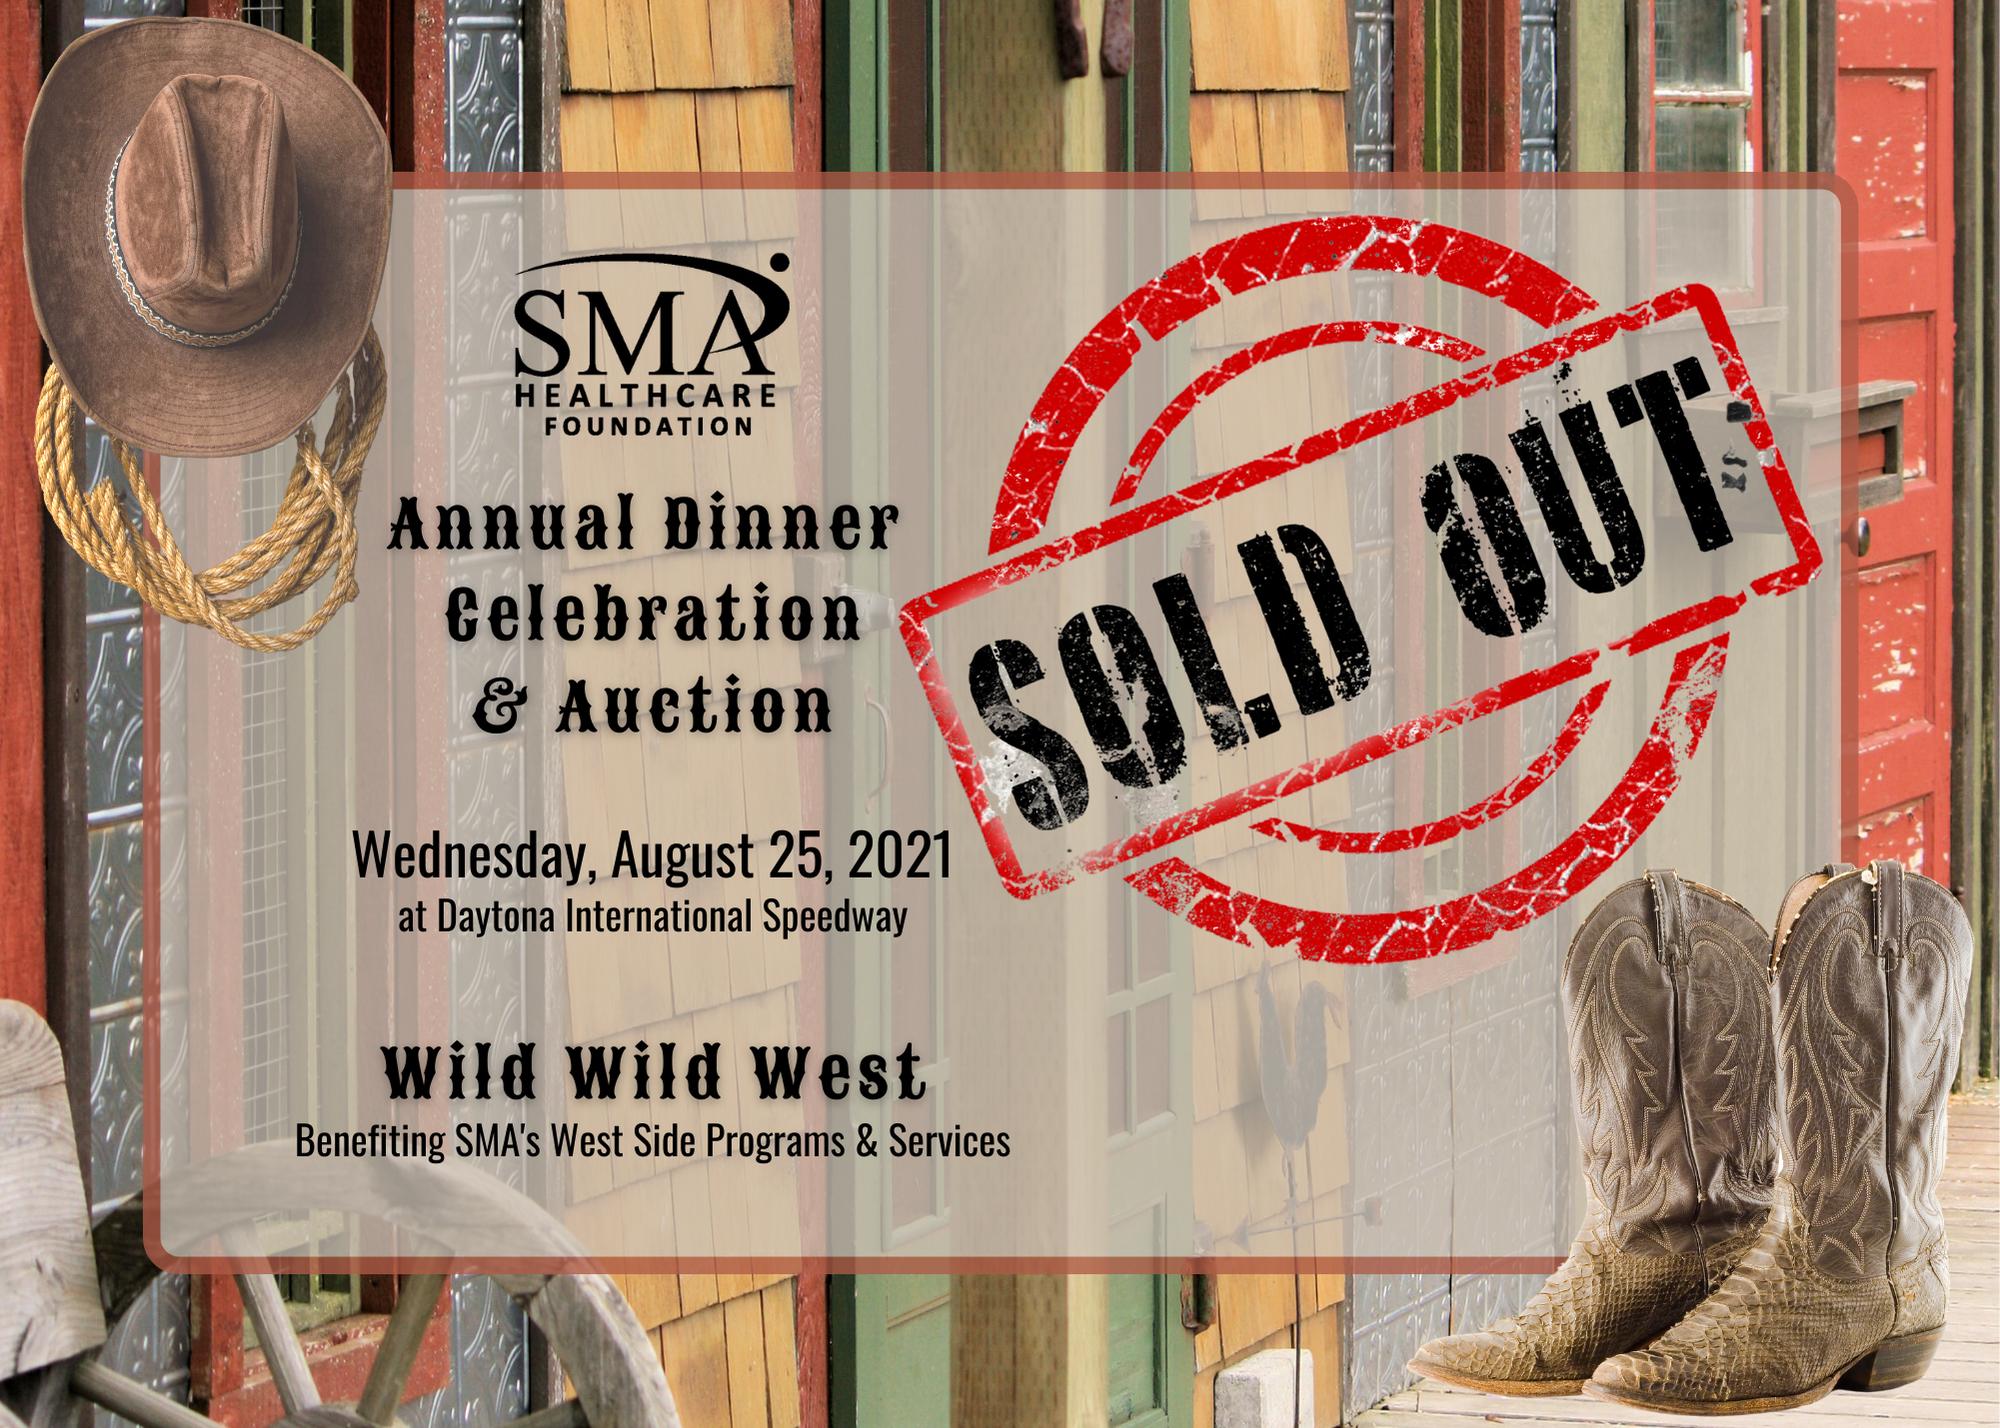 Annual Dinner Celebration & Auction 2021